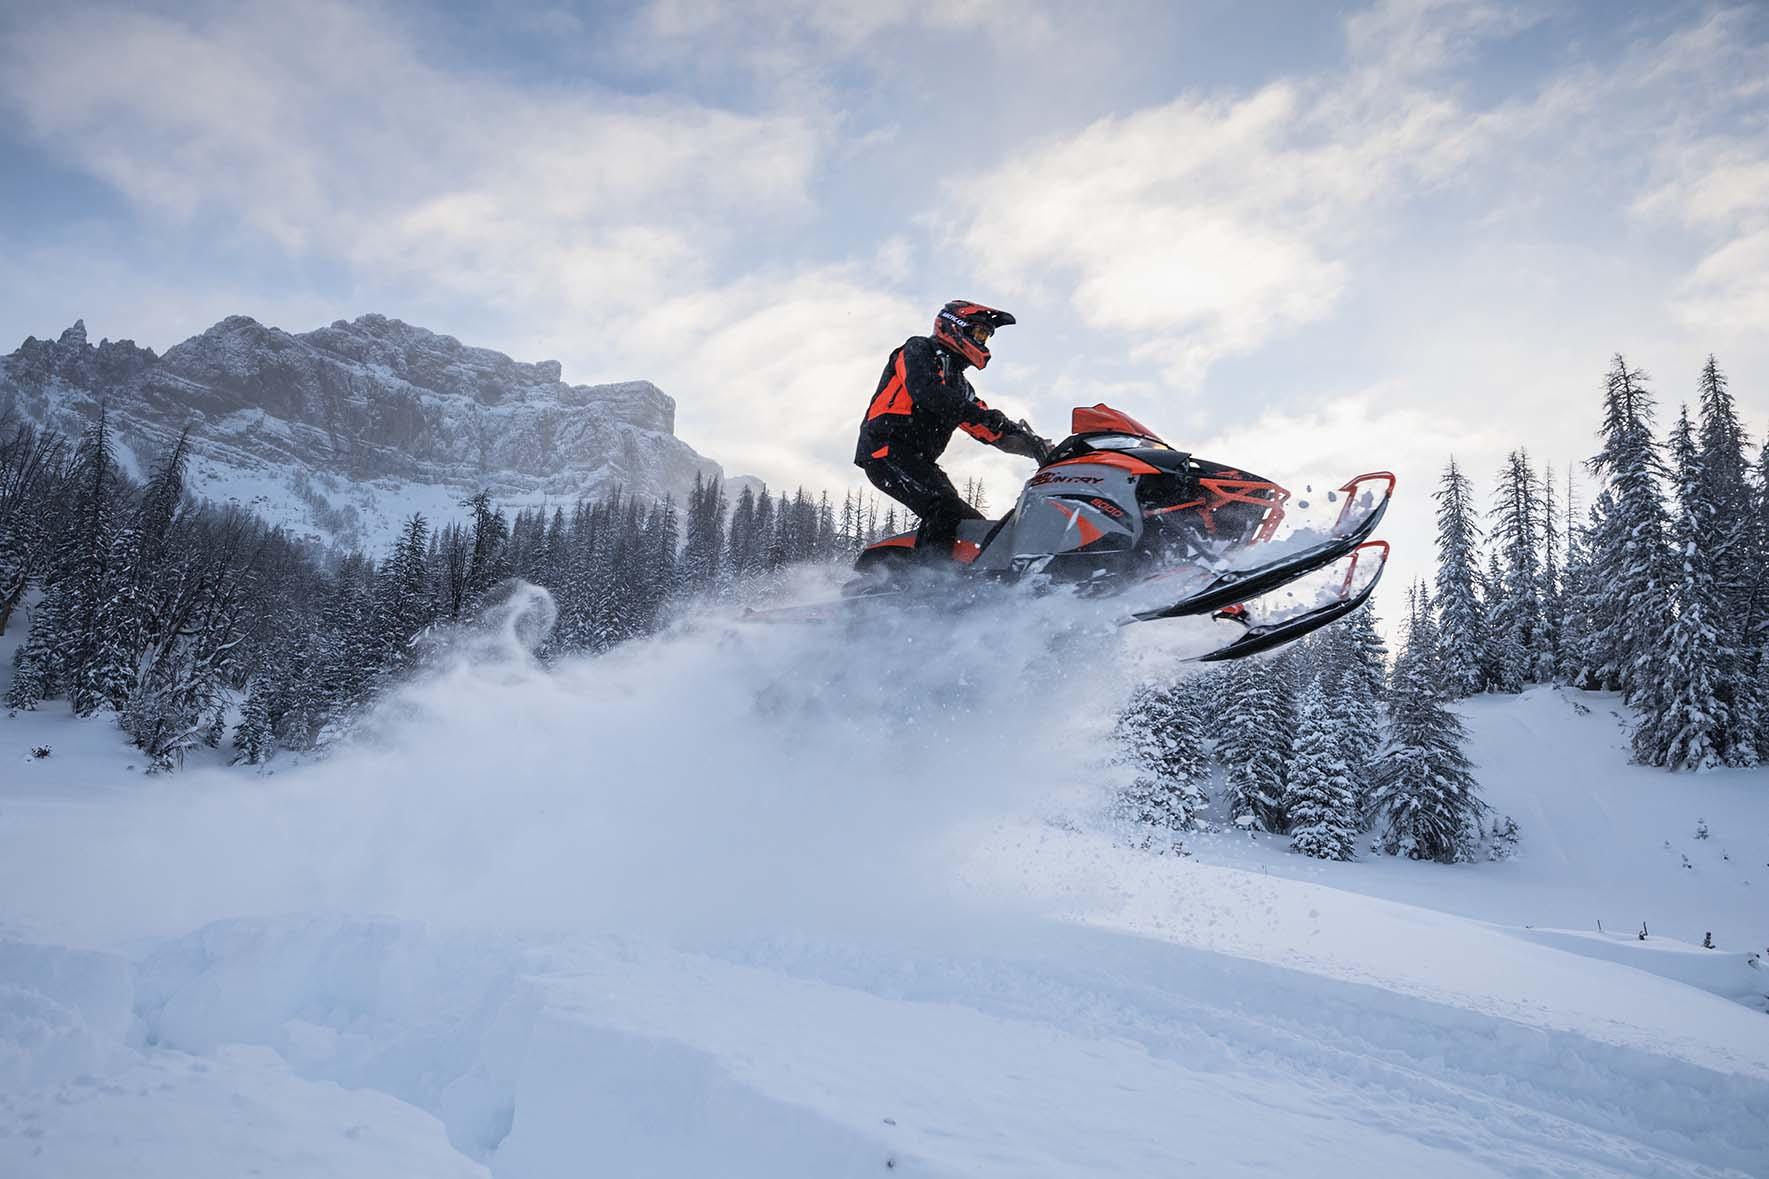 пиджаки снегоход картинки спорт всё